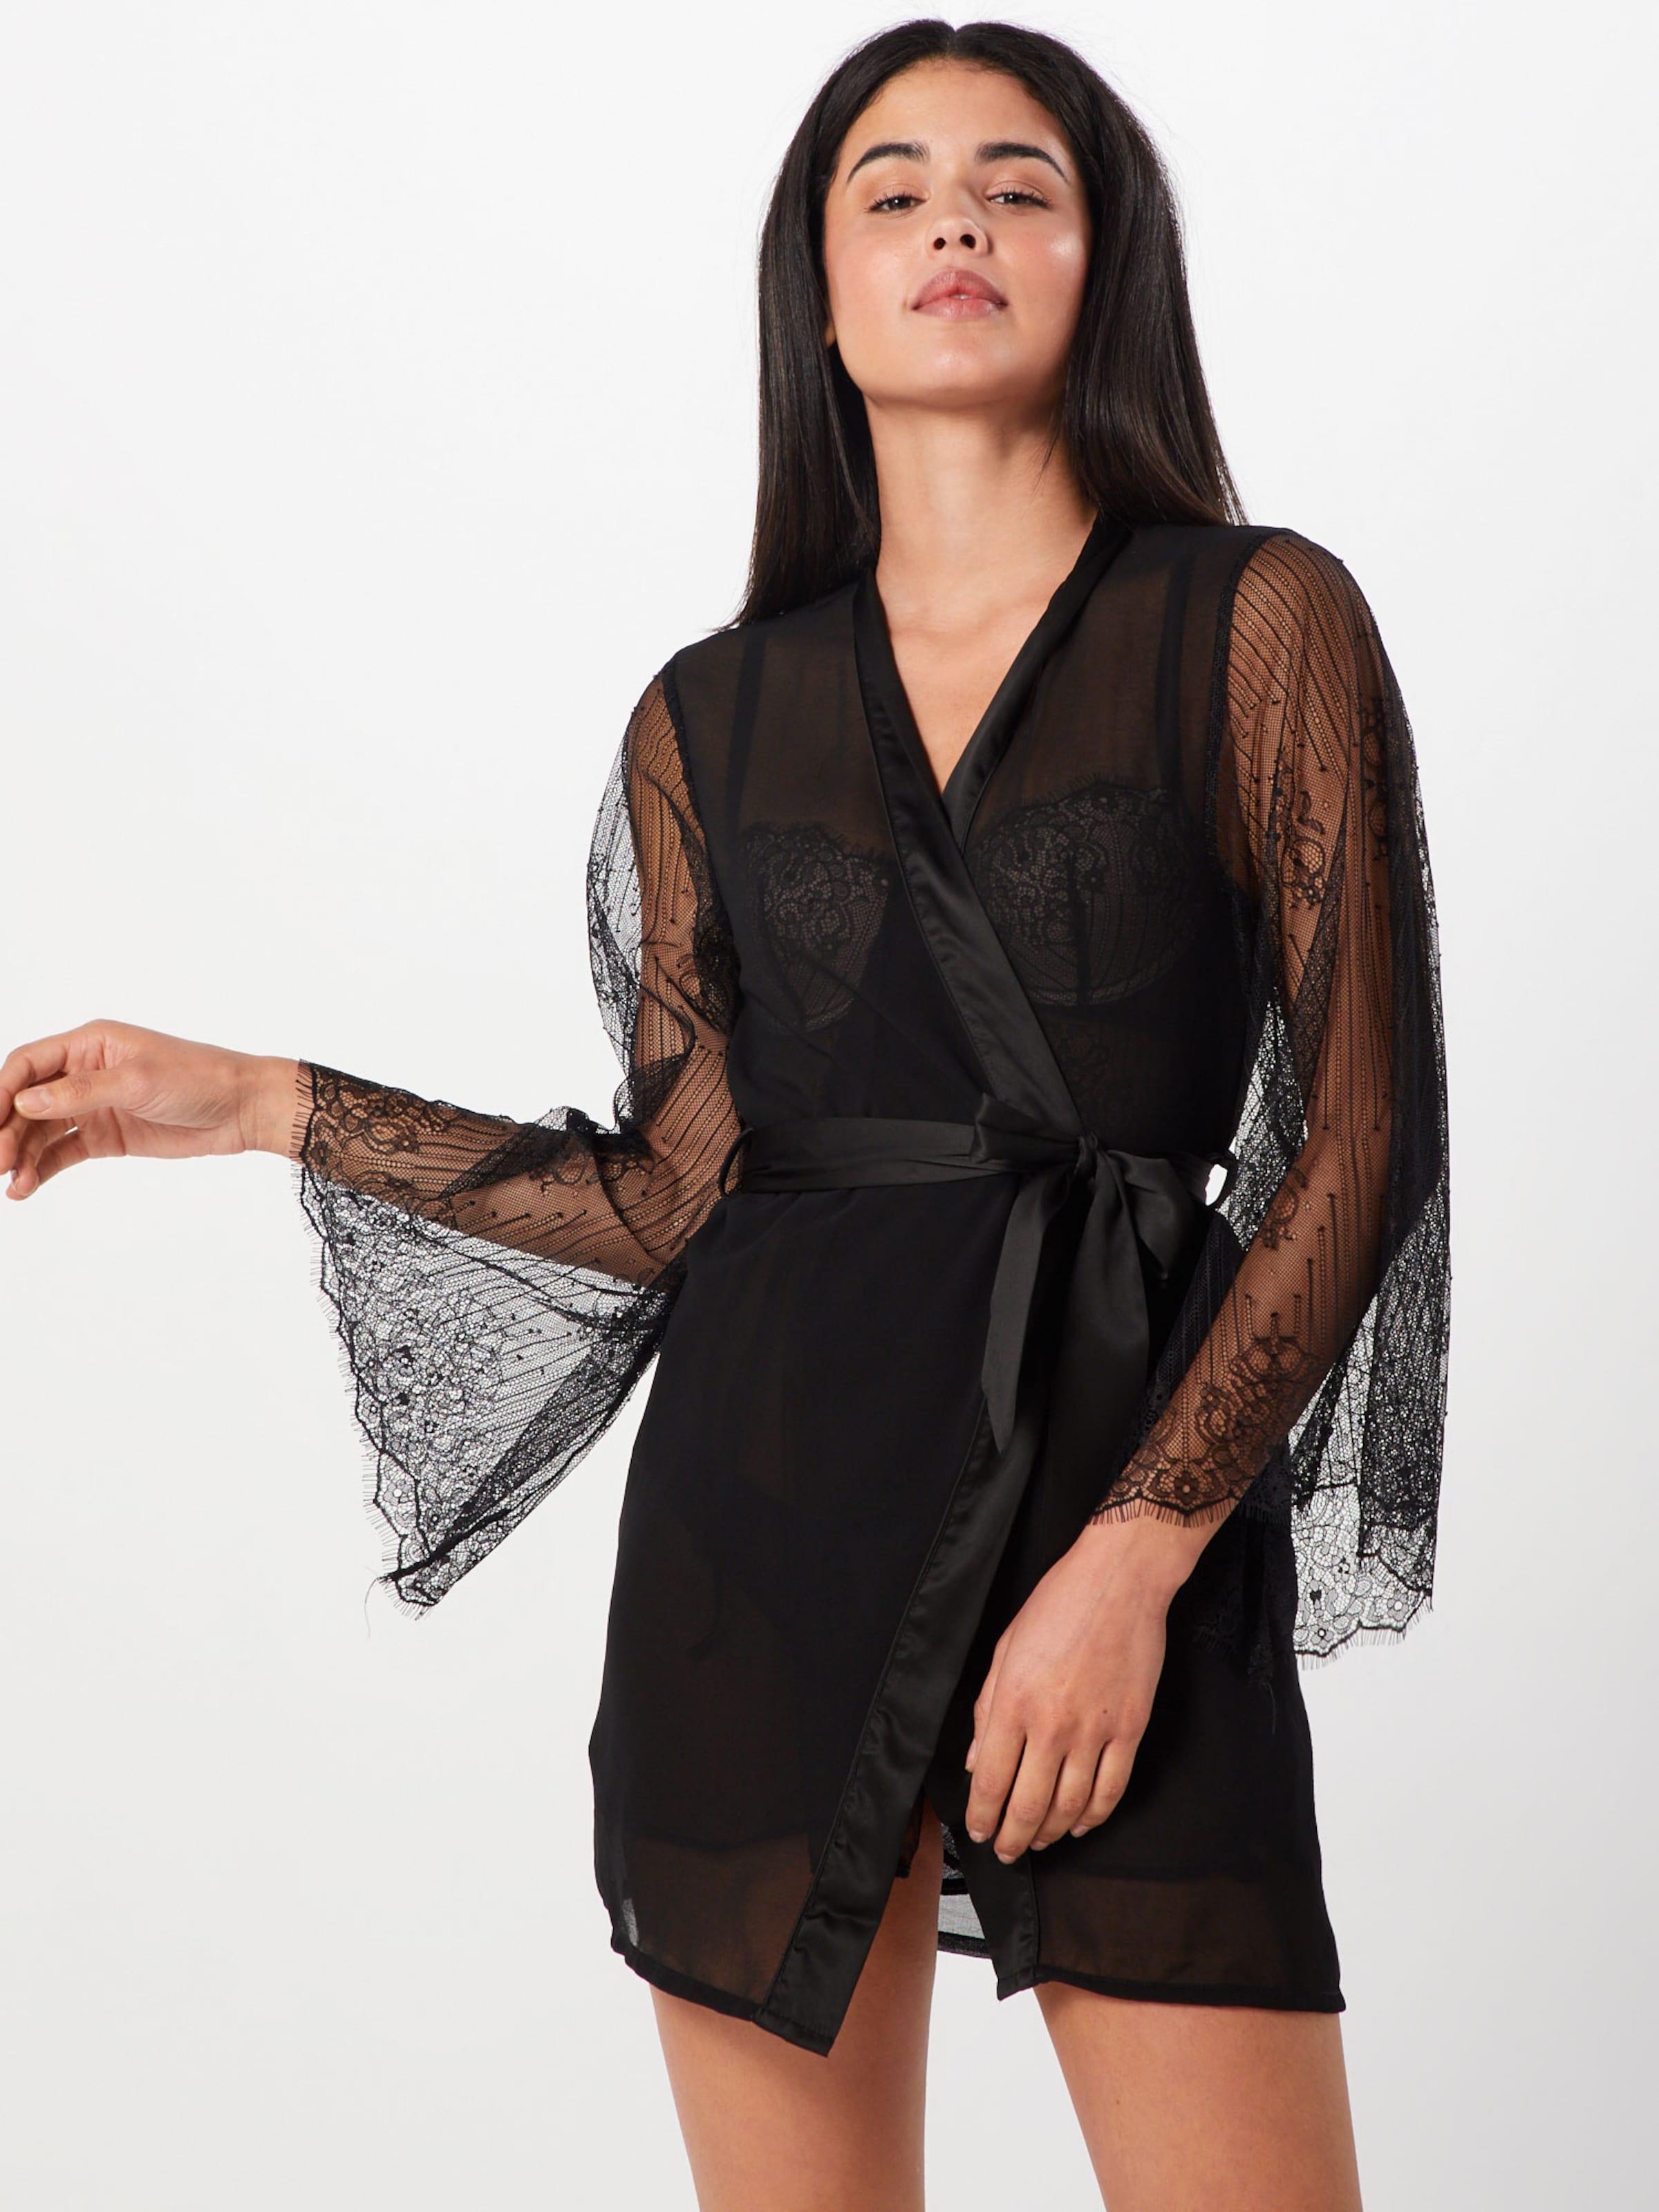 Robe Noir En Hunkemöller De Chambre edrxBoC